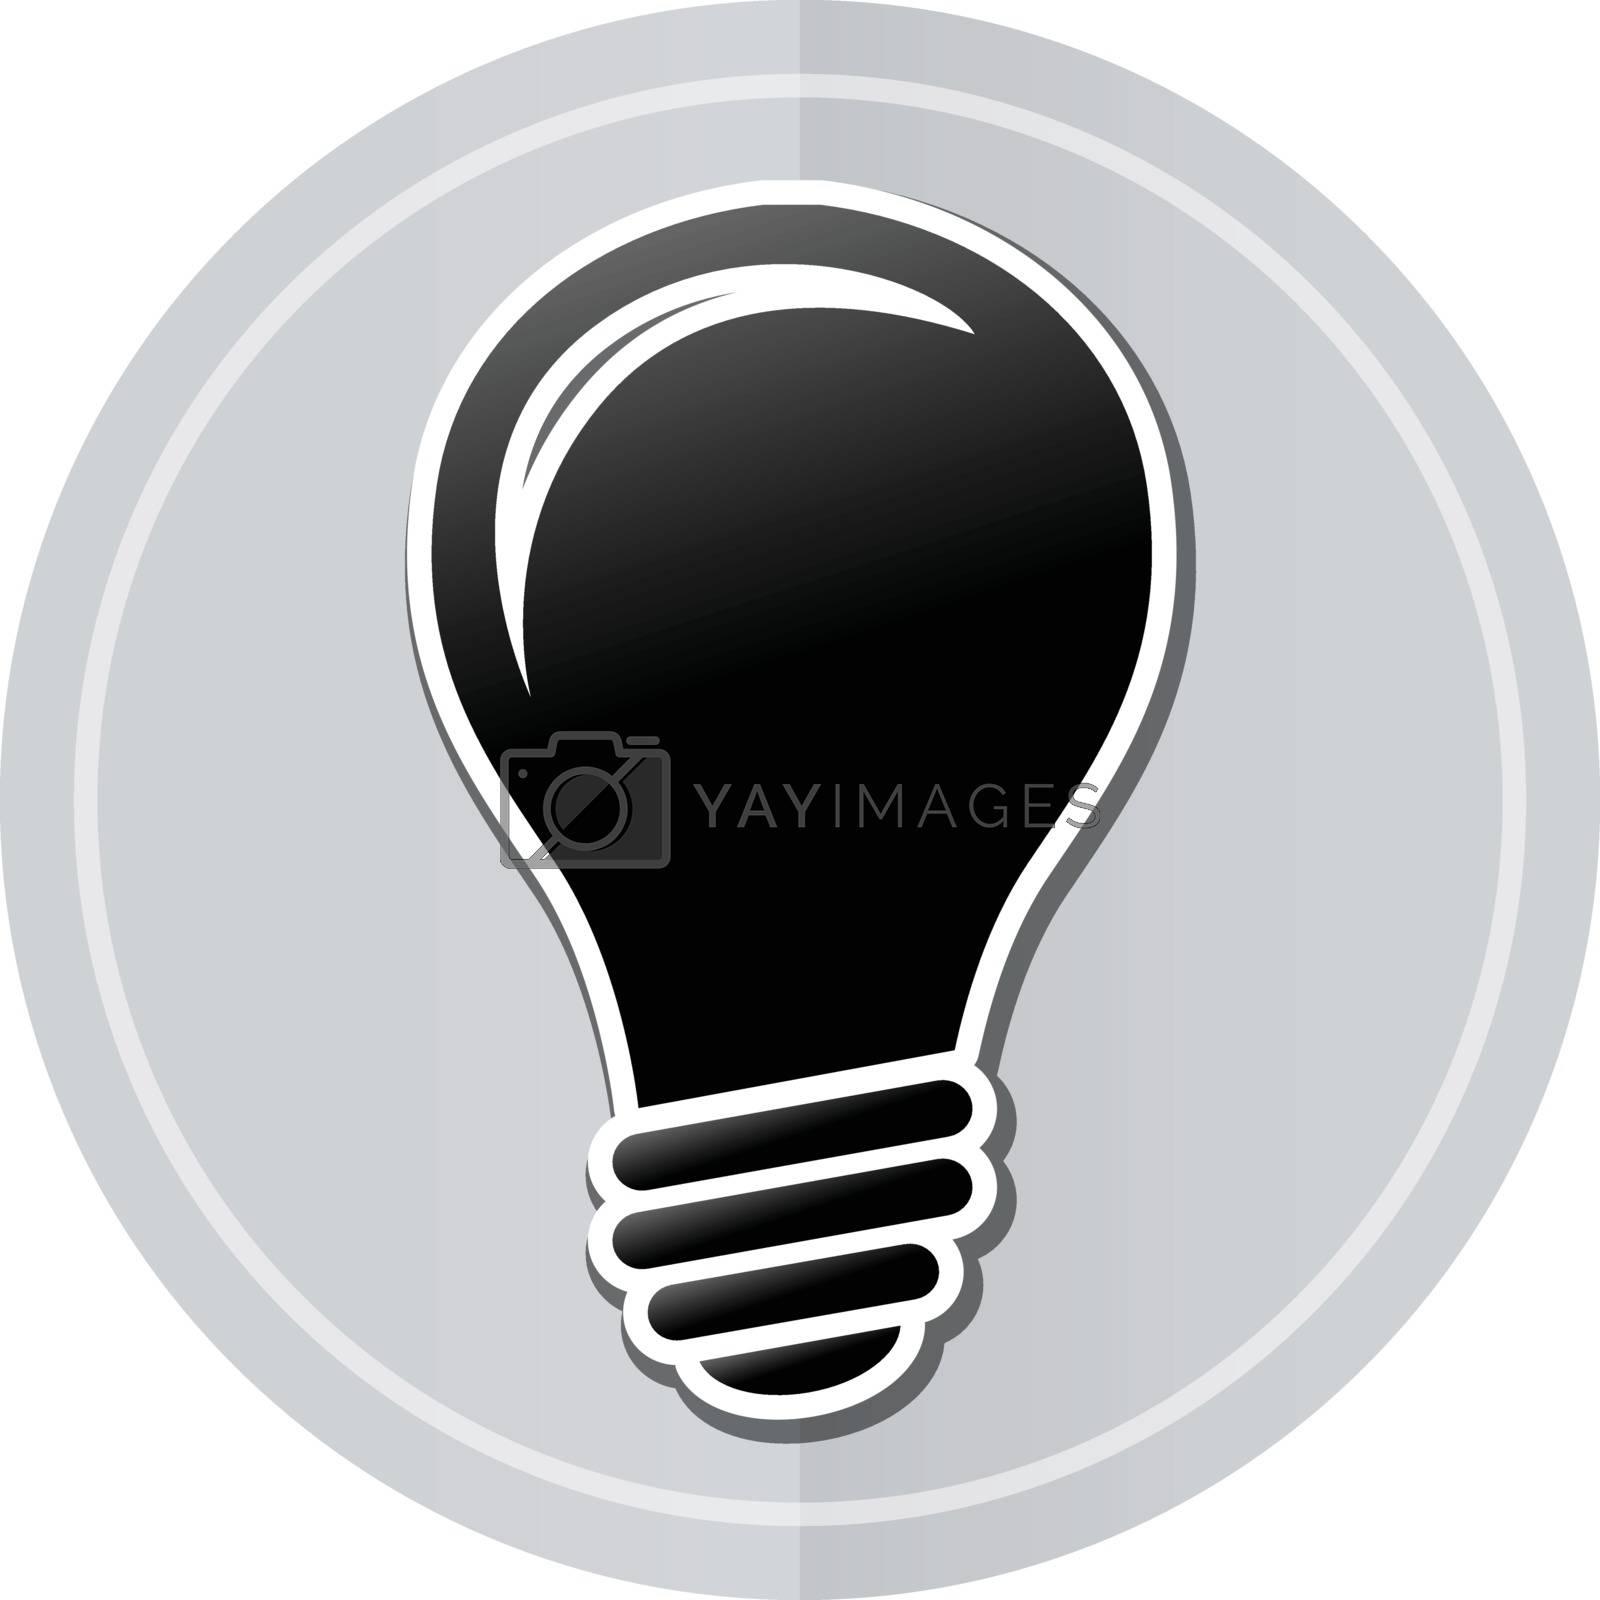 Illustration of lightbulb sticker icon simple design